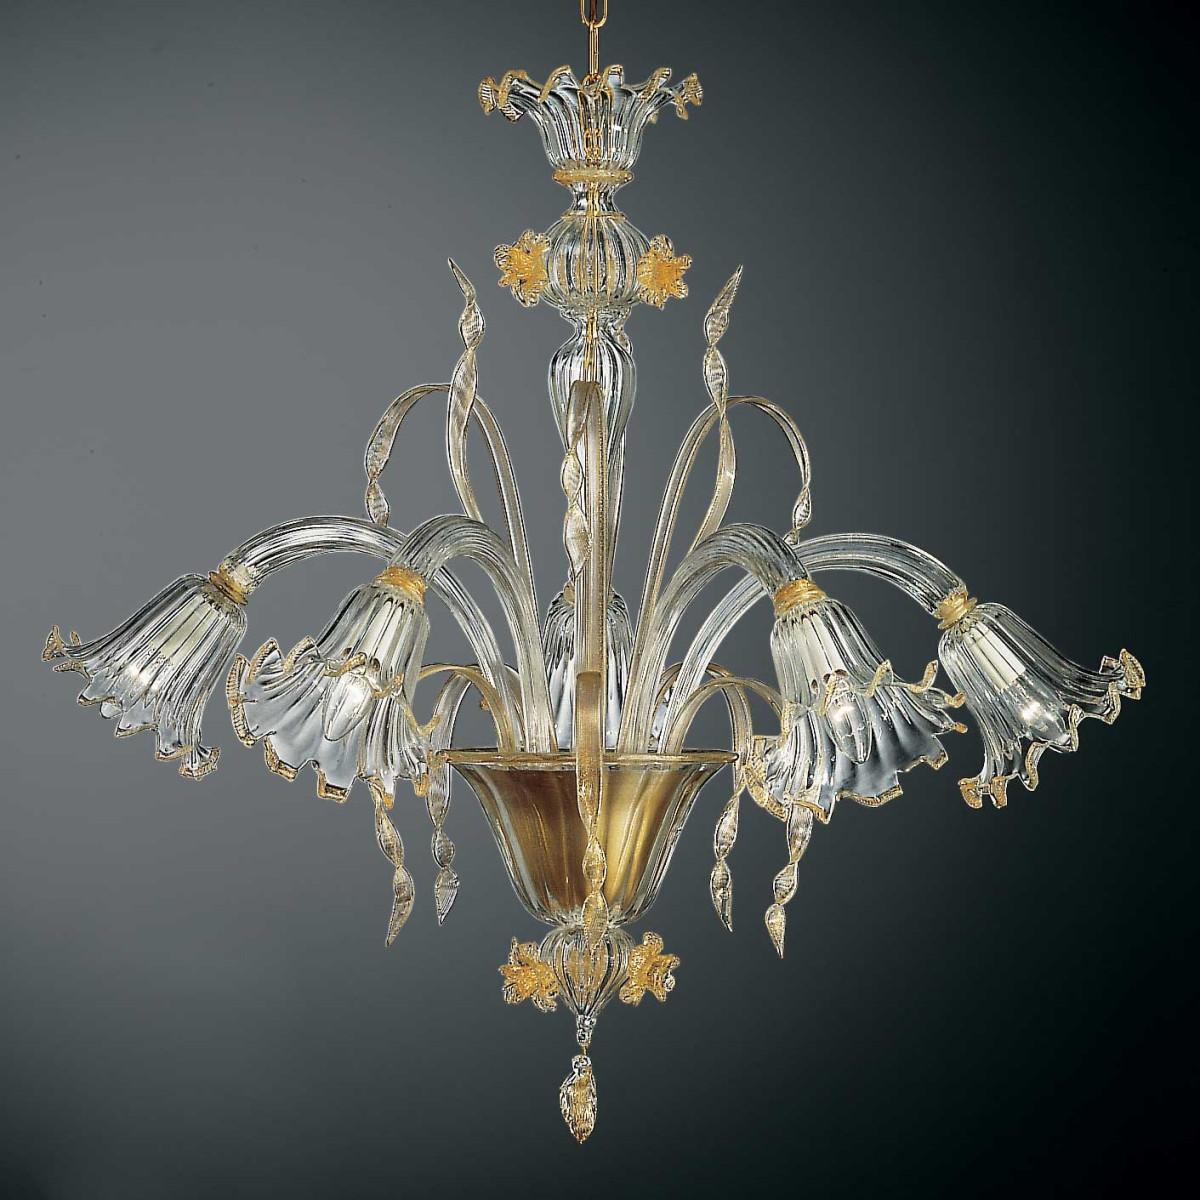 Mori 5 flammig Murano Kronleuchter - transparent Gold Farbe